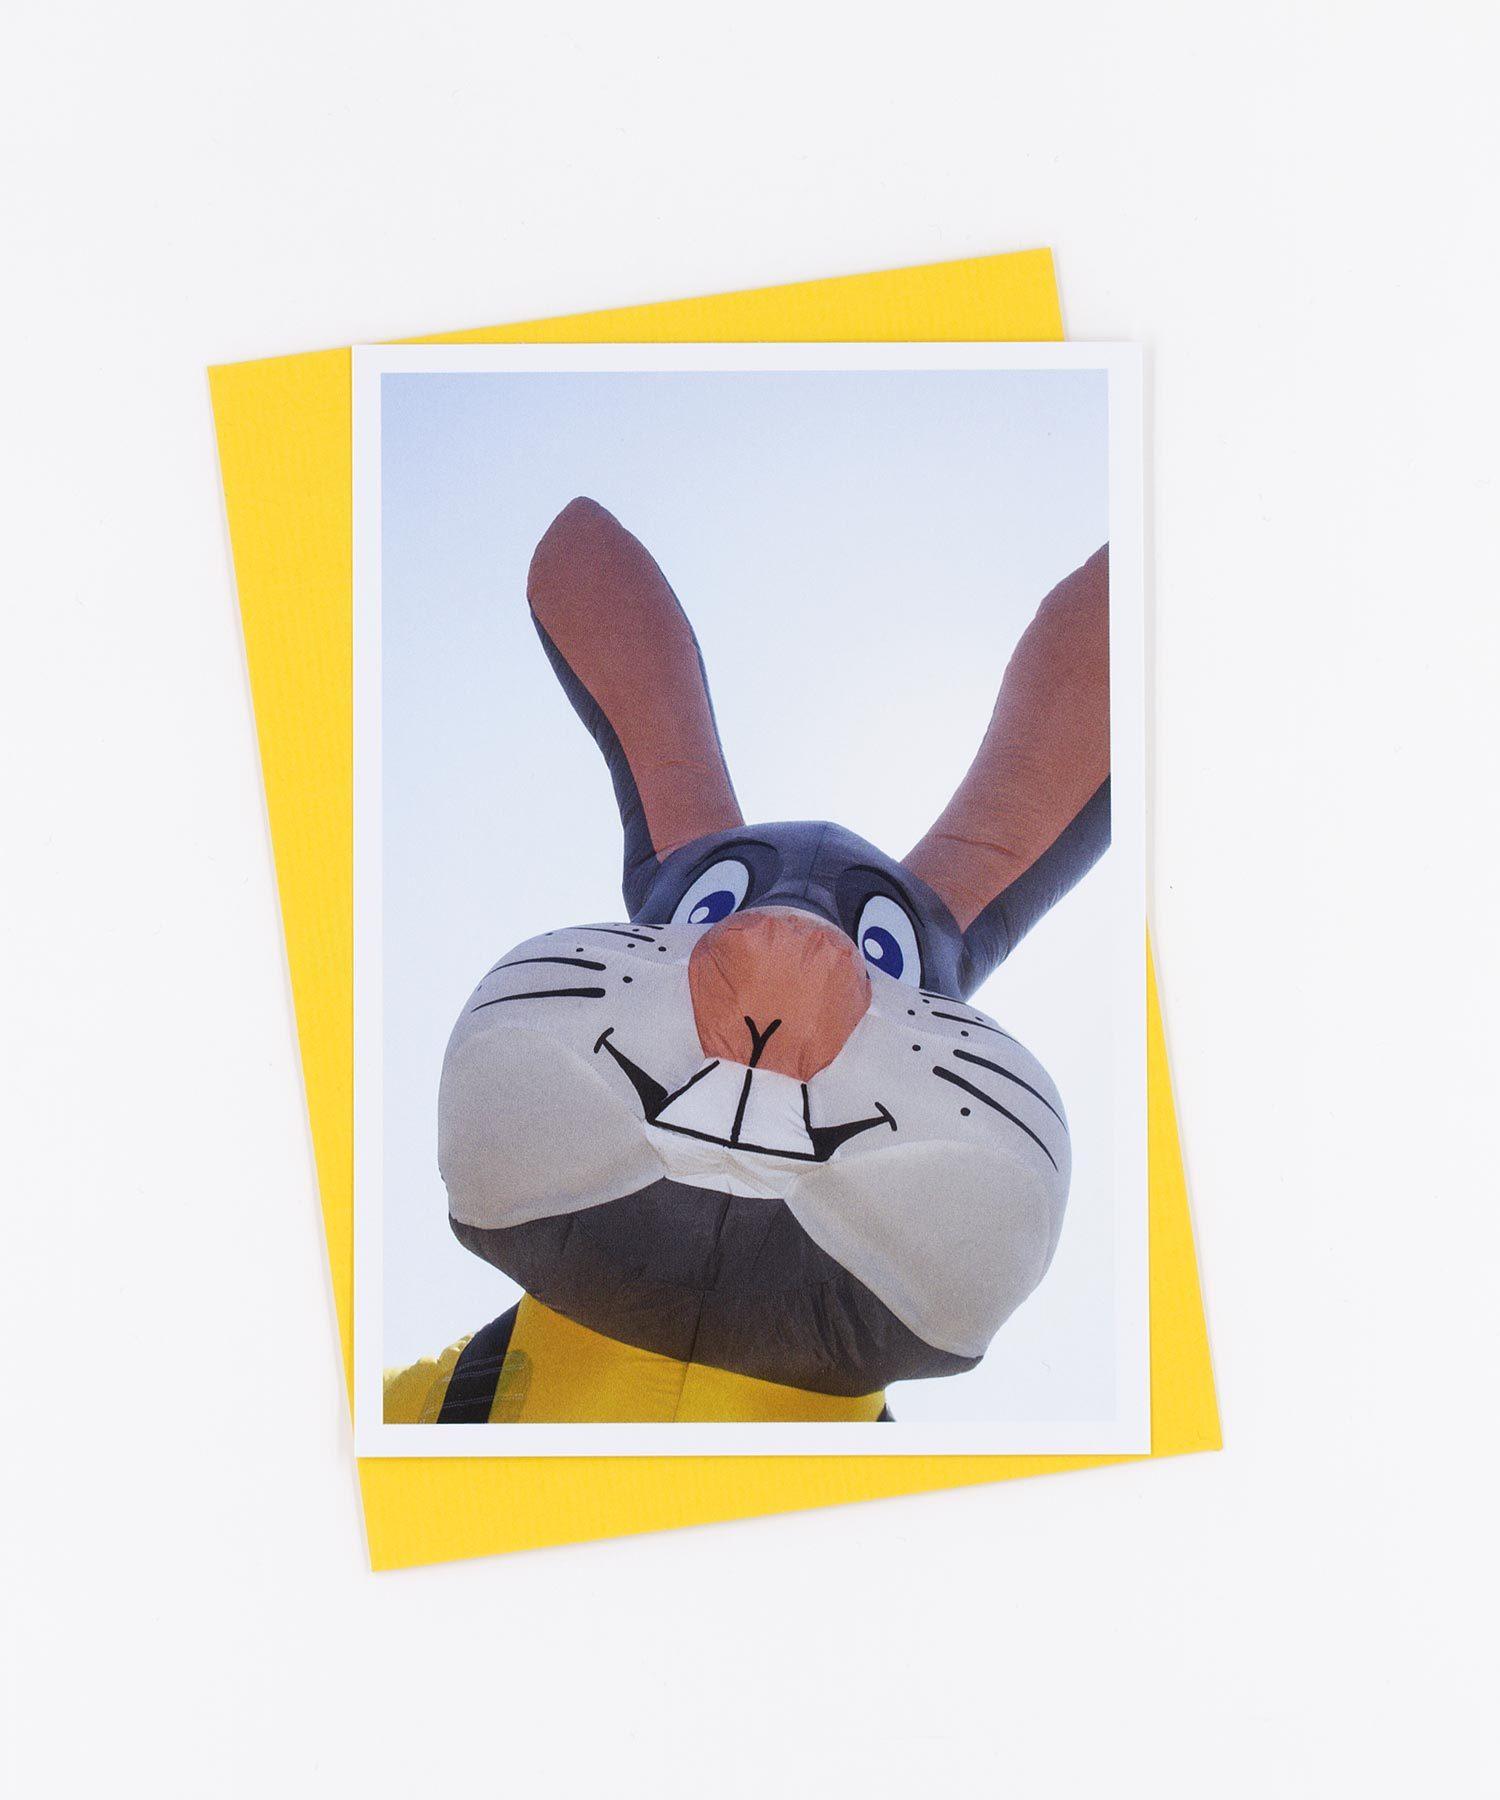 Fotopostkarte Bunny